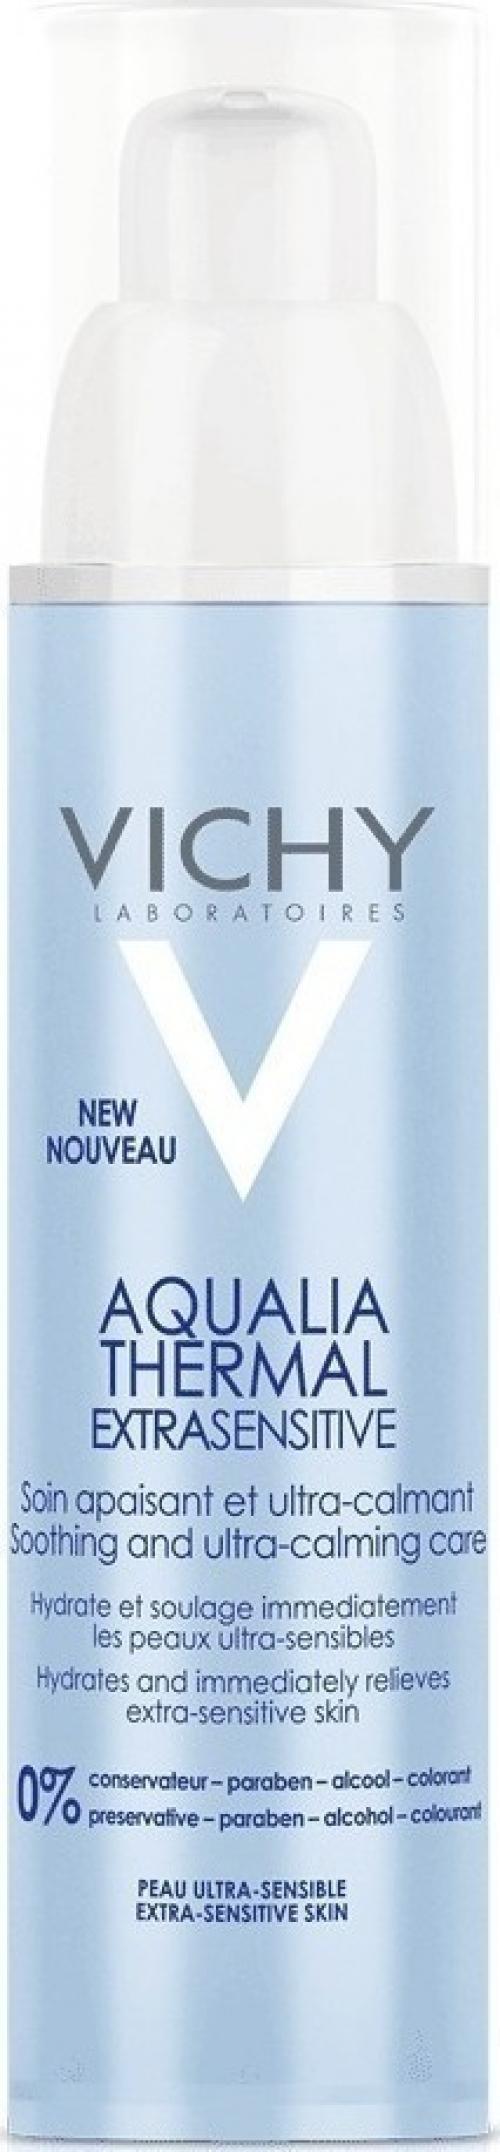 Vichy Aqualia Thermal Extrasensitive Ενυδατική Προσώπου για Ξηρές/Ευαίσθητες Επιδερμίδες 50ml